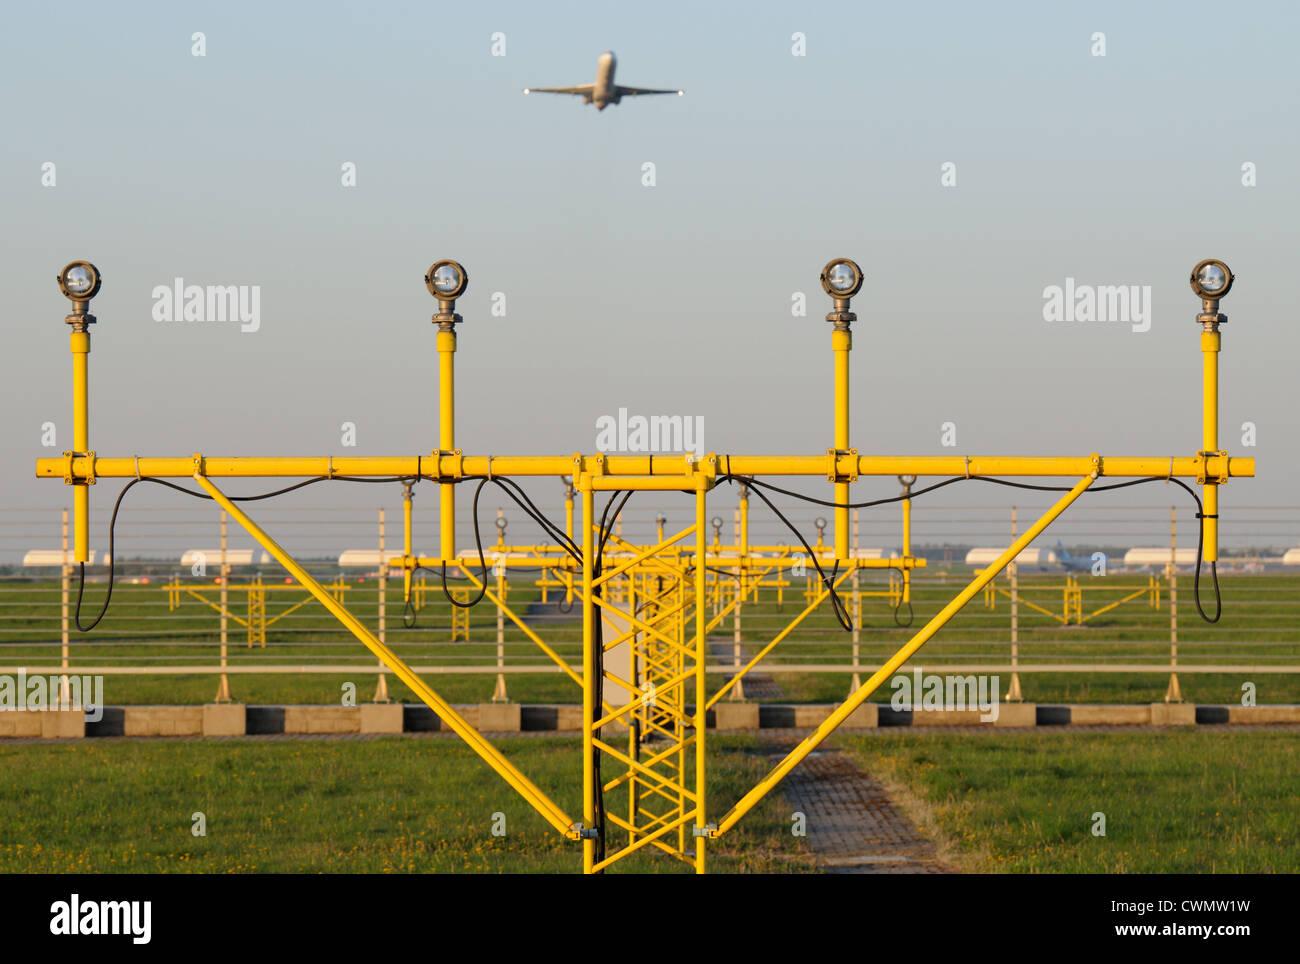 Airport Runway Equipment - Approach Lighting - Stock Image